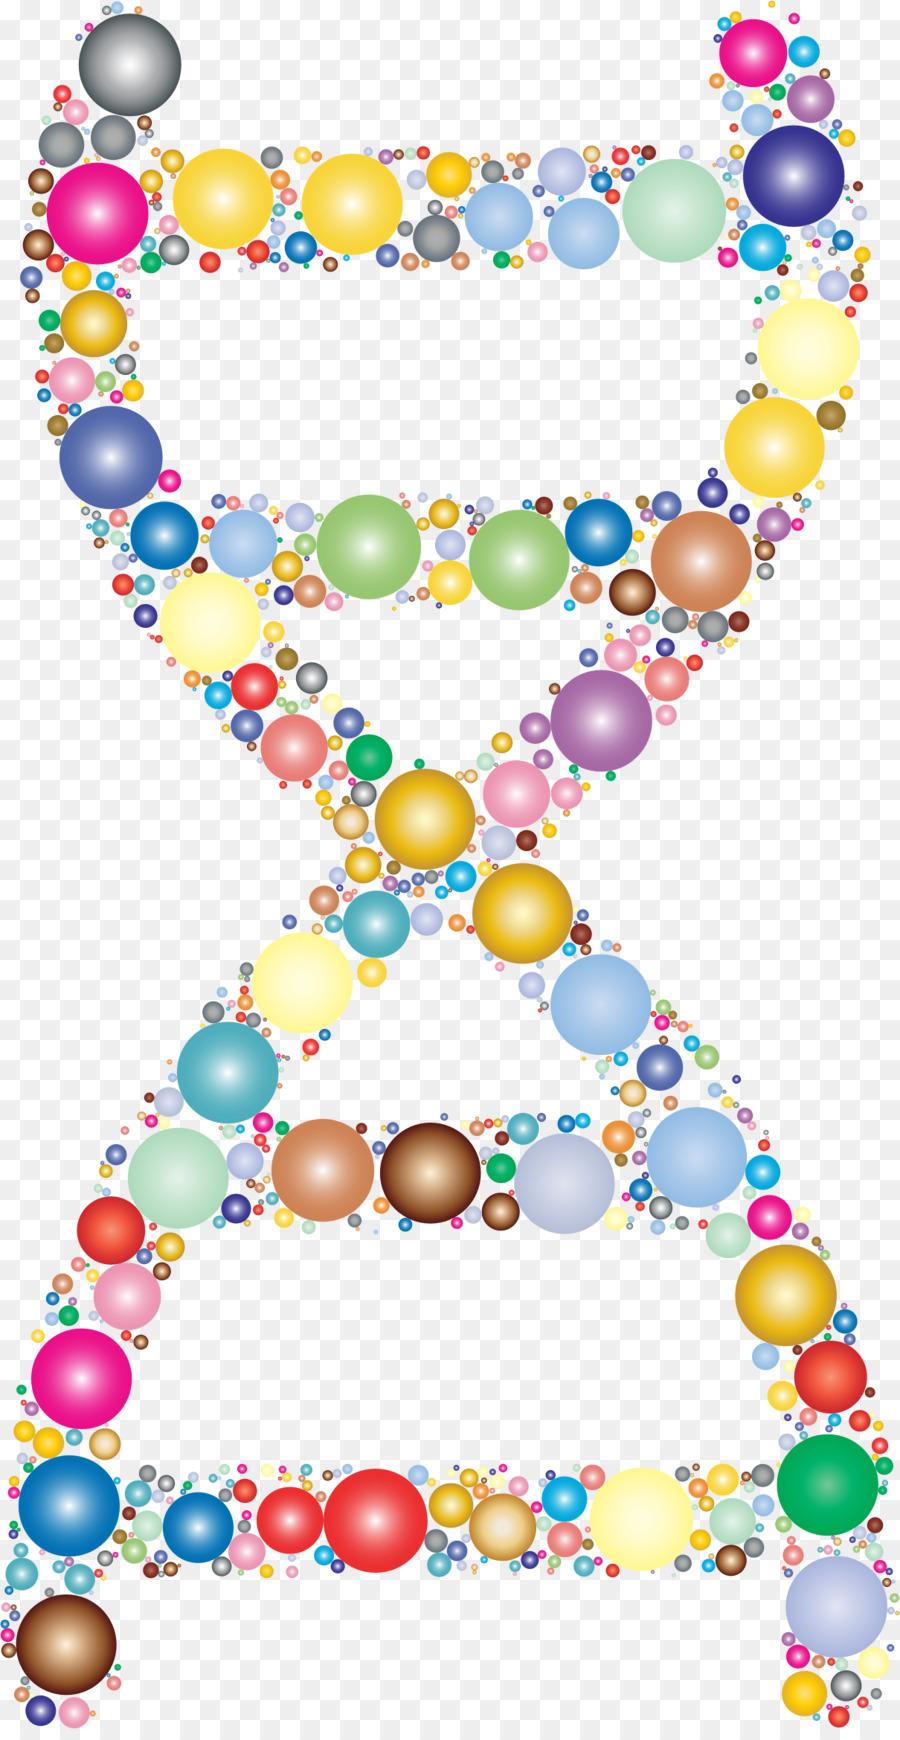 Biology clipart molecular biology. Circle design dna transparent